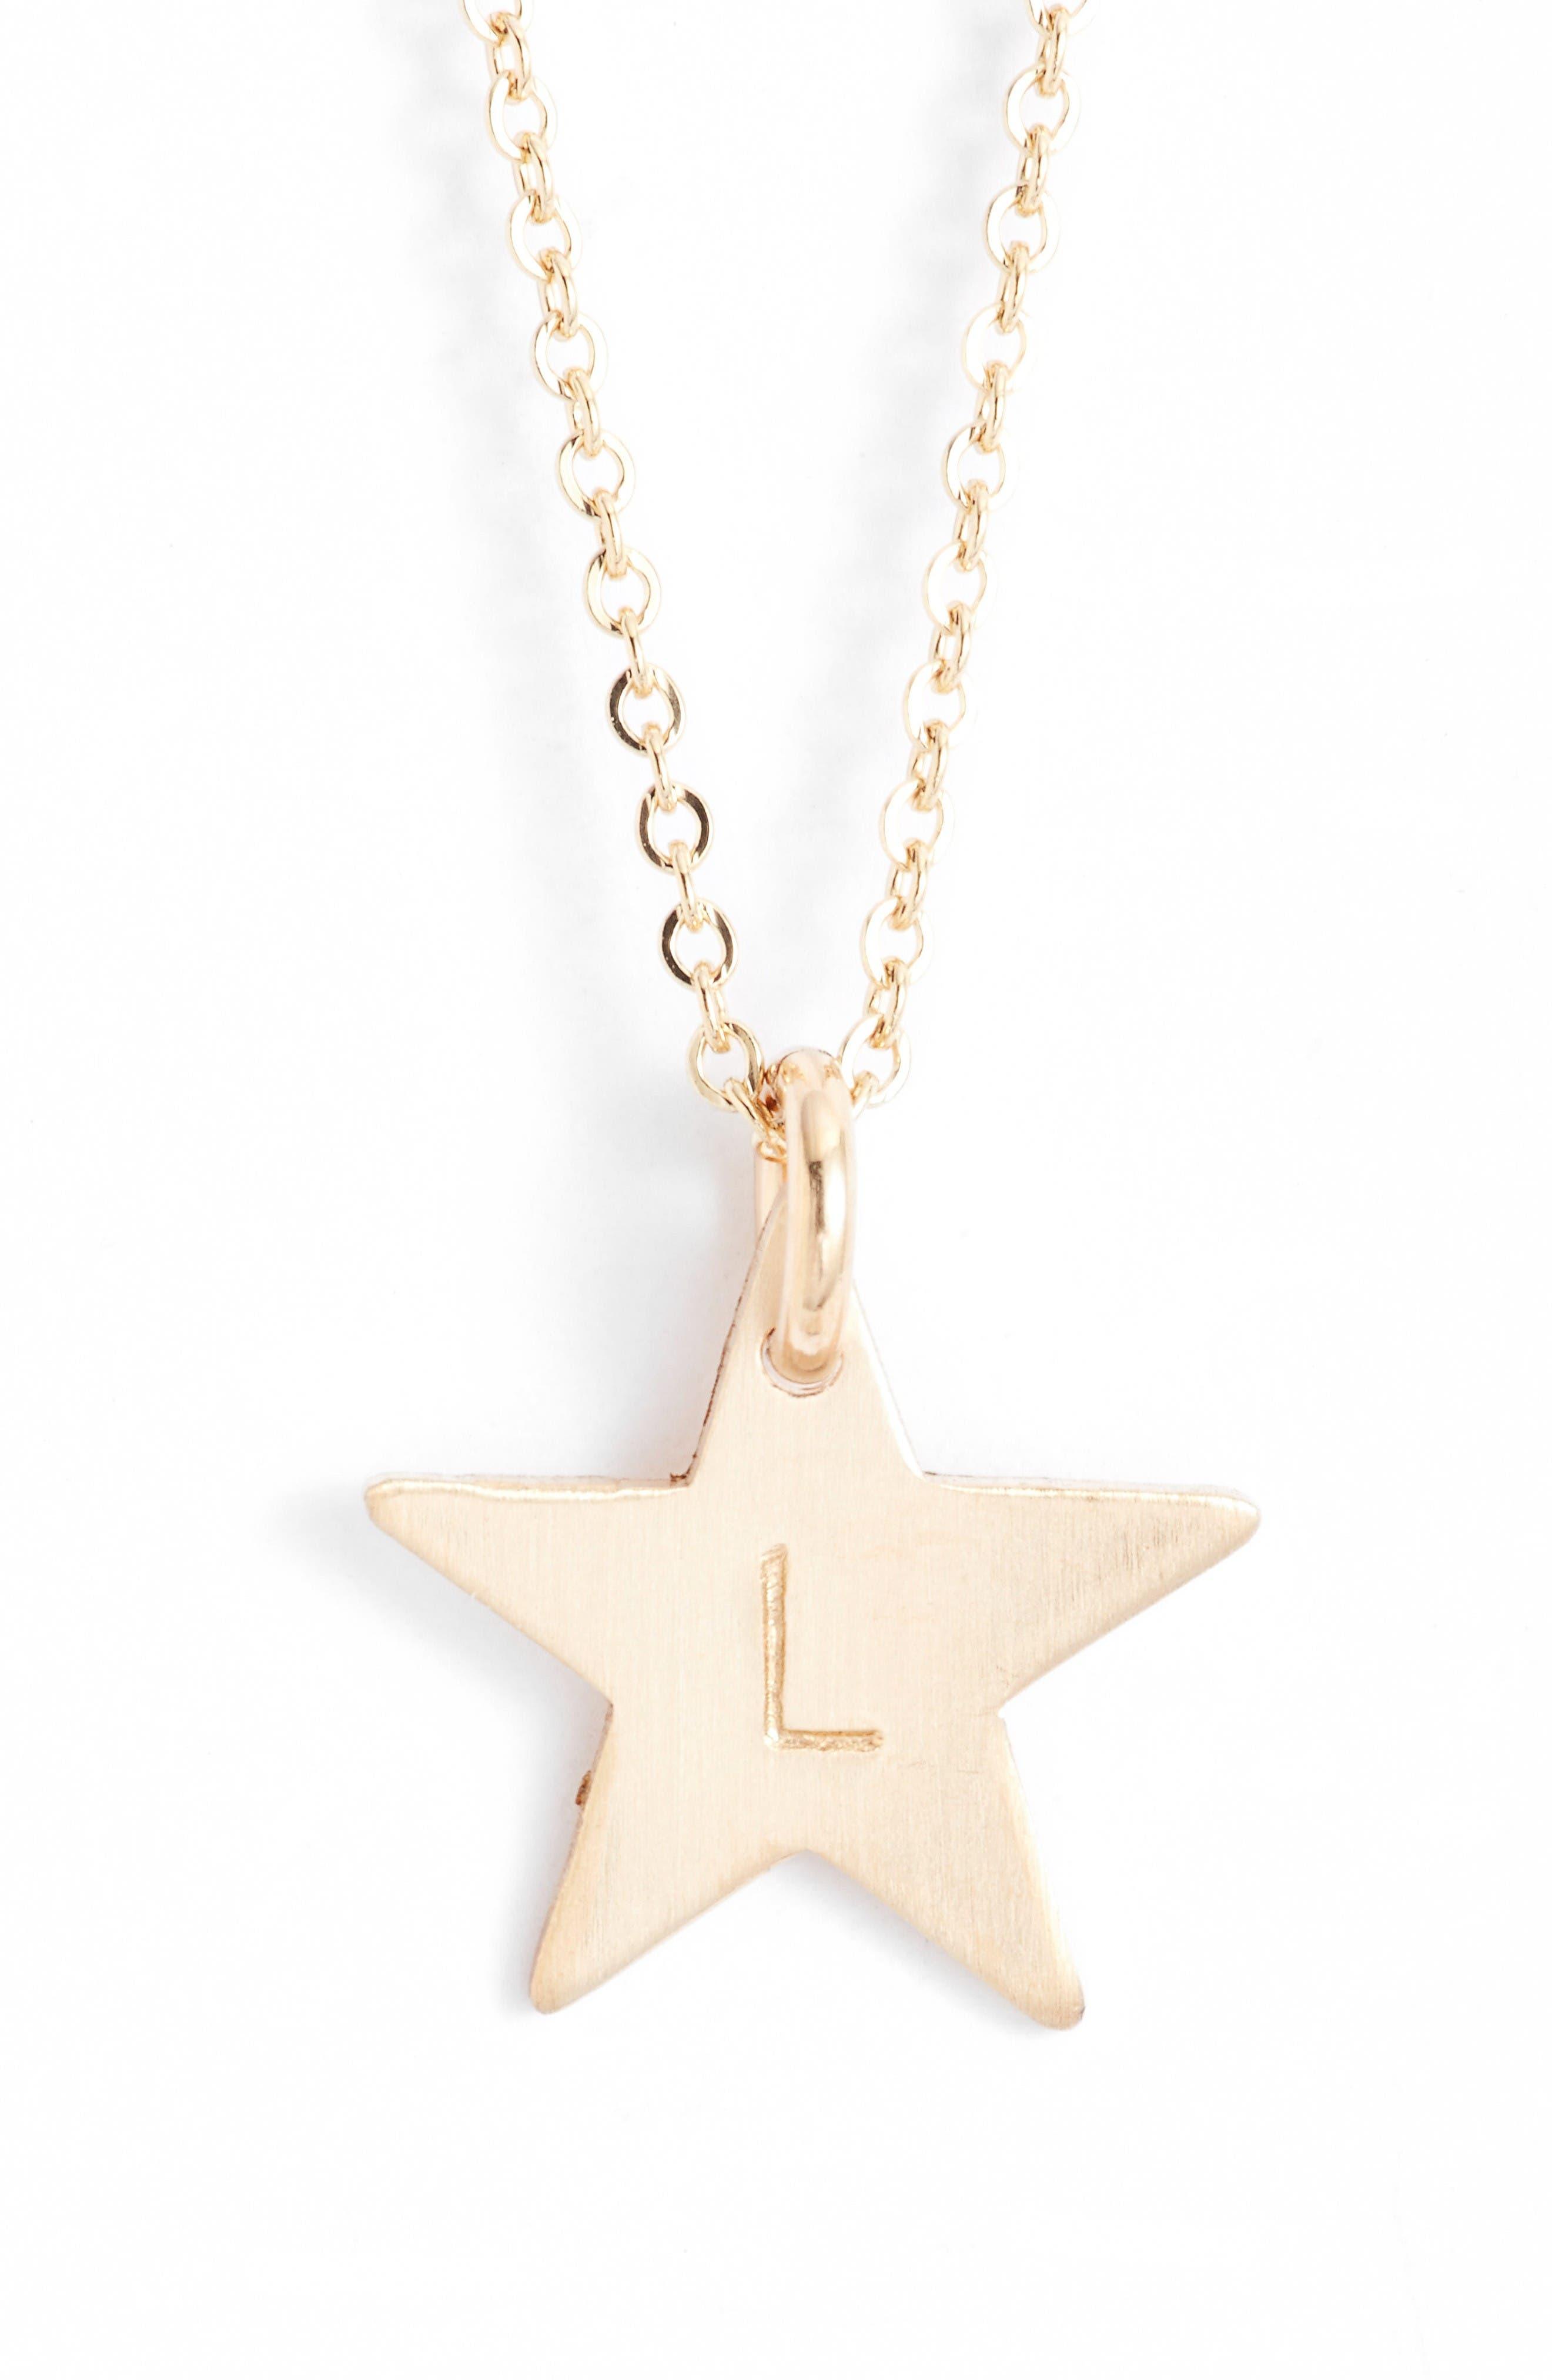 14k-Gold Fill Initial Mini Star Pendant Necklace,                         Main,                         color, Gold/ L